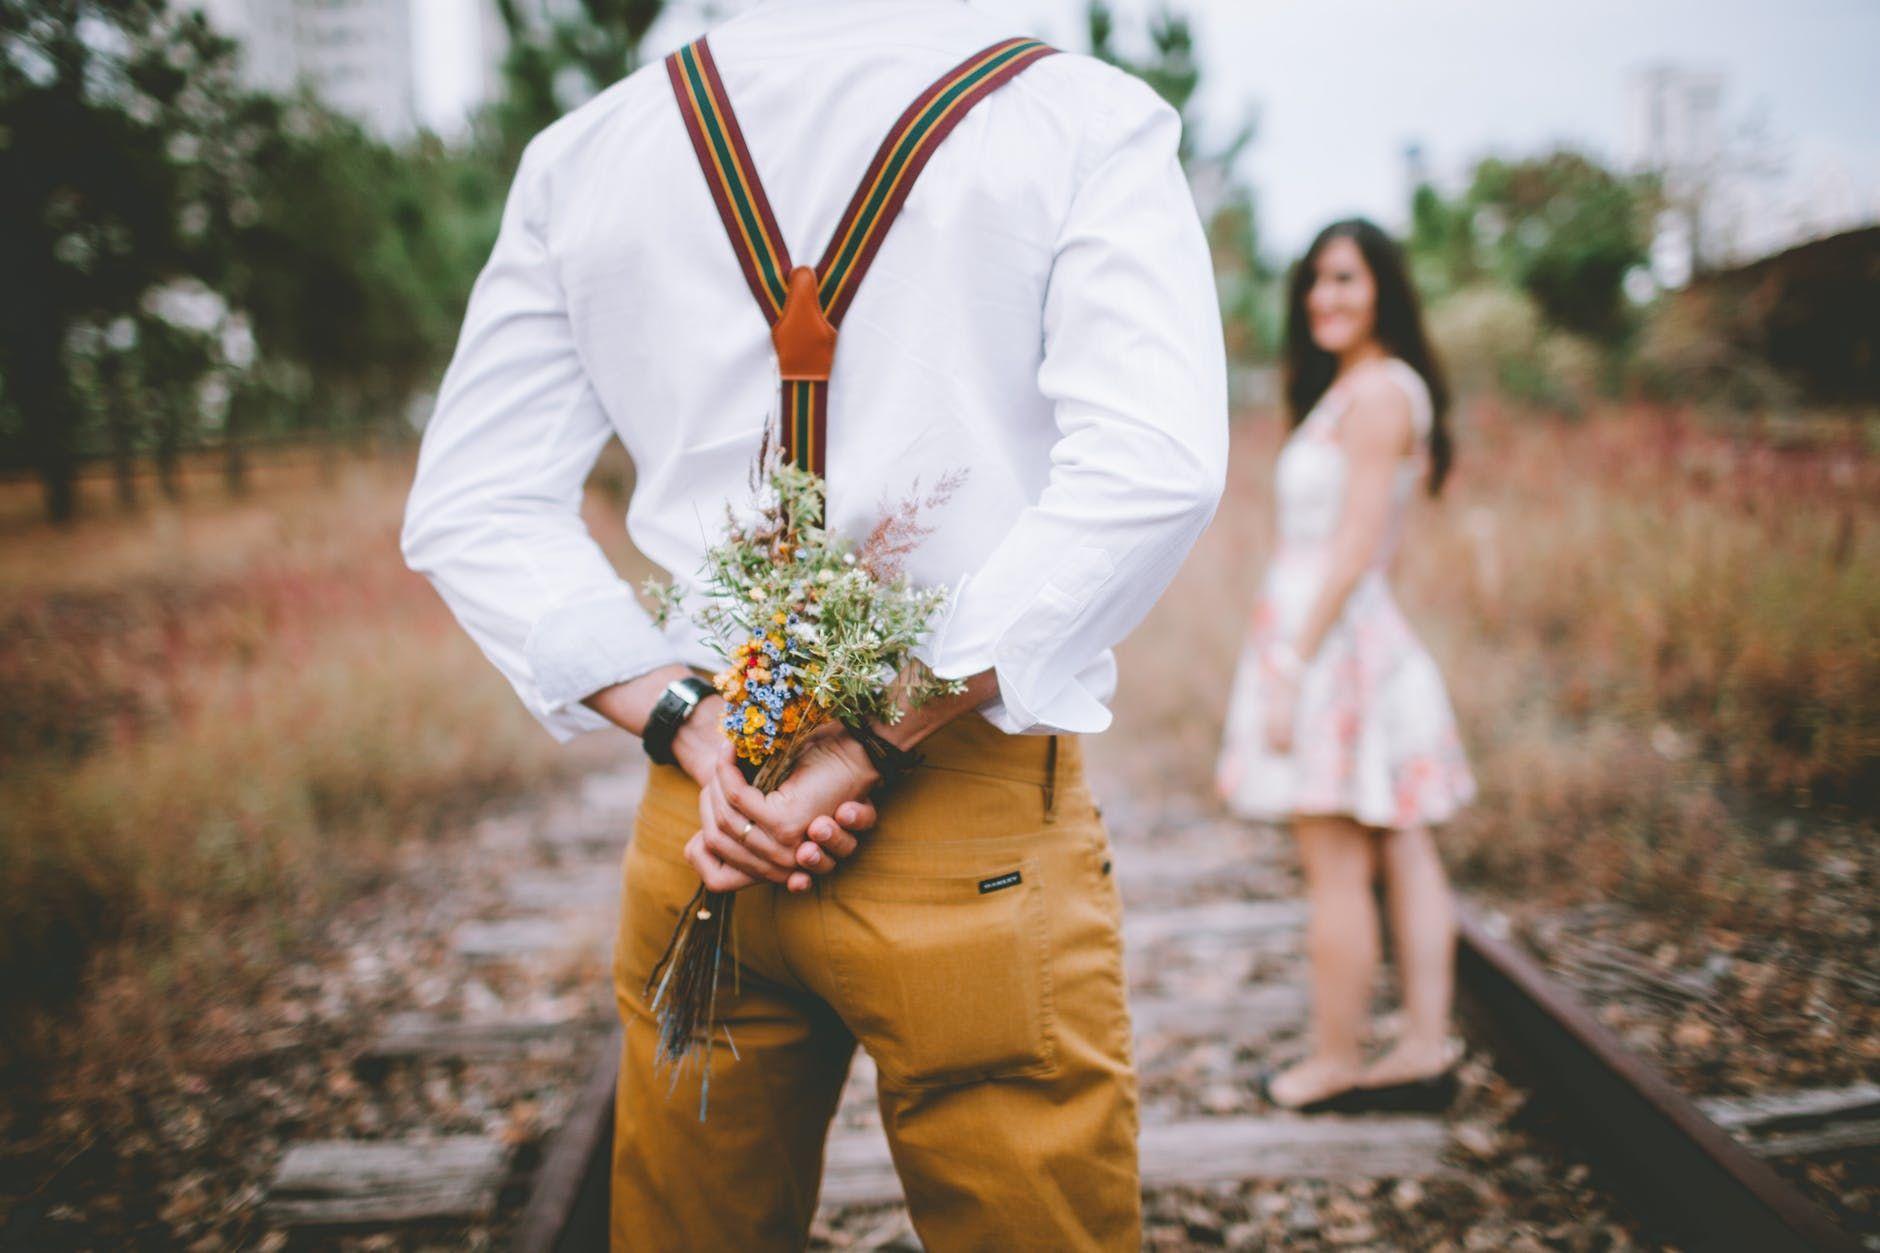 25 Caption Cinta Romantis untuk Percantik Feed Instagram